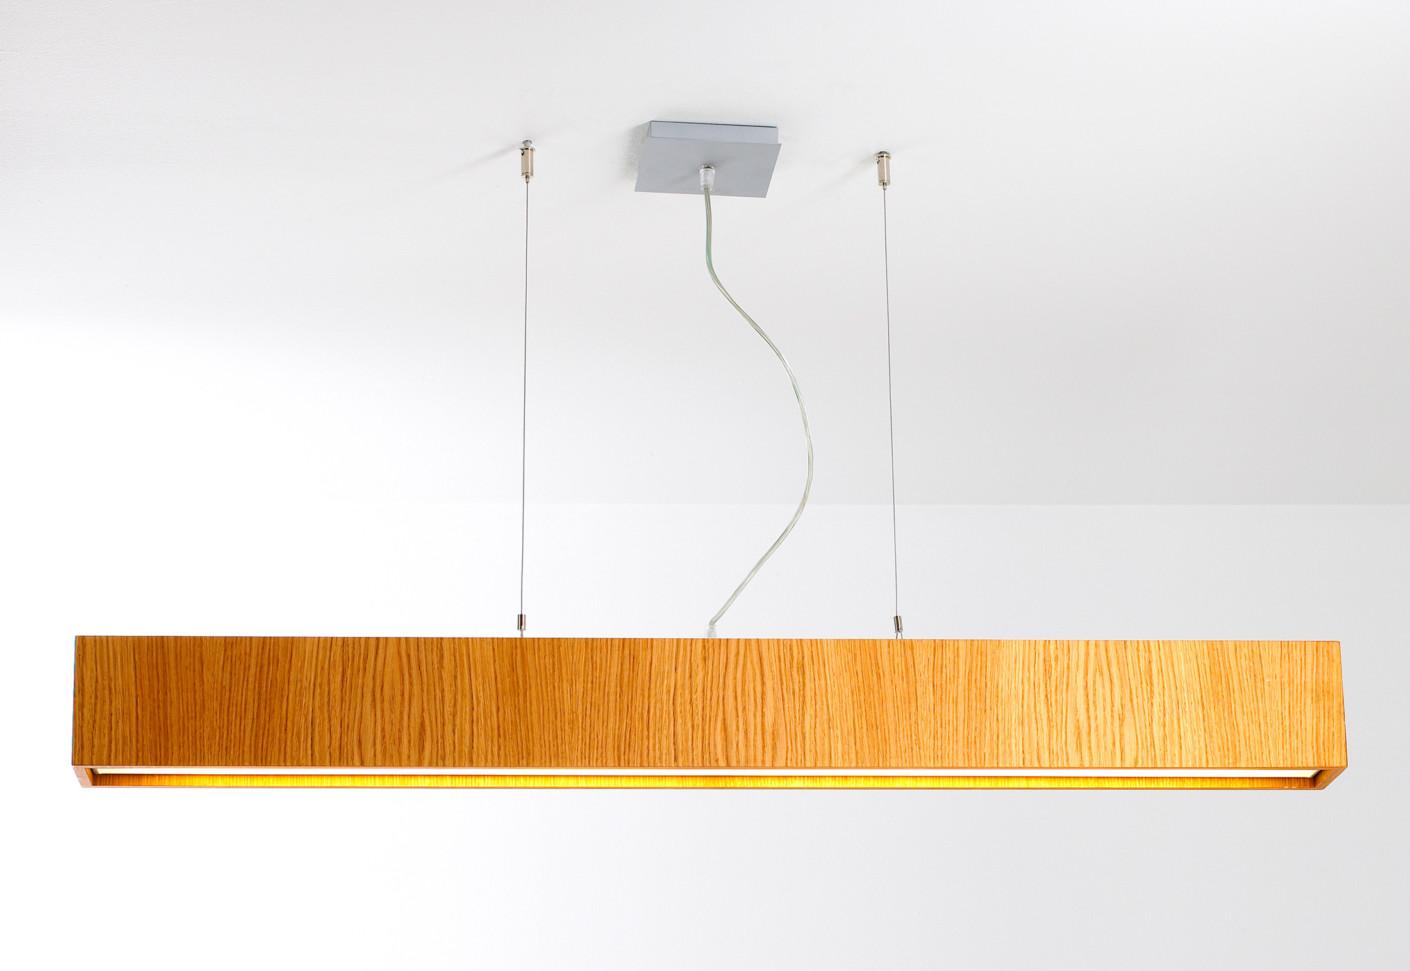 Quadrat S120x10 Lámpara Colgante 2x55W 2G11 - blanco